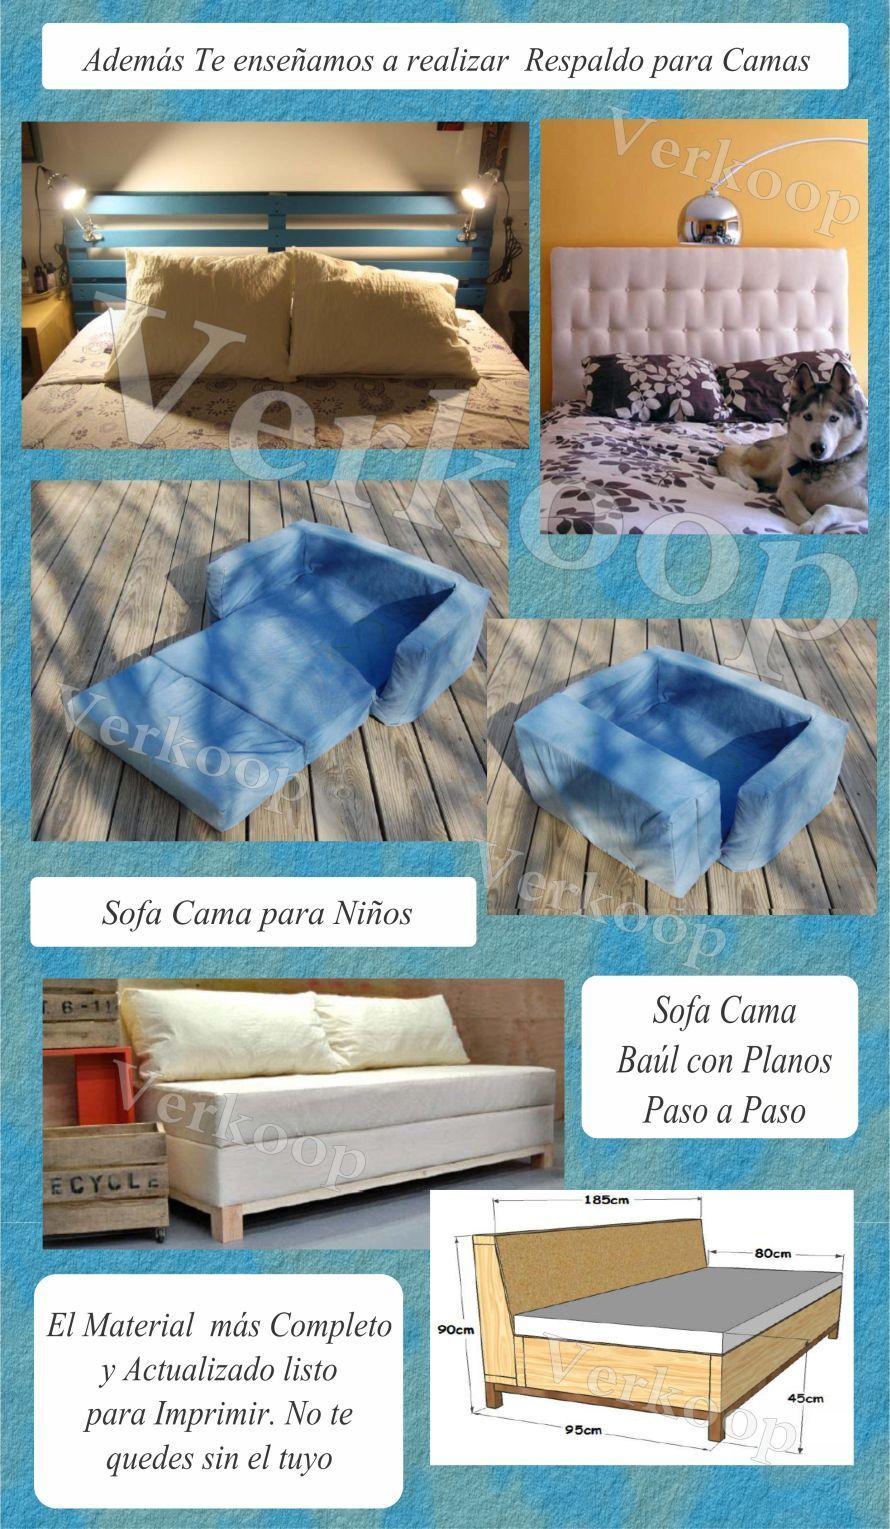 Curso Muebles Con Palets Puffs Sofas Camas Cojines Fundas | Curso ...